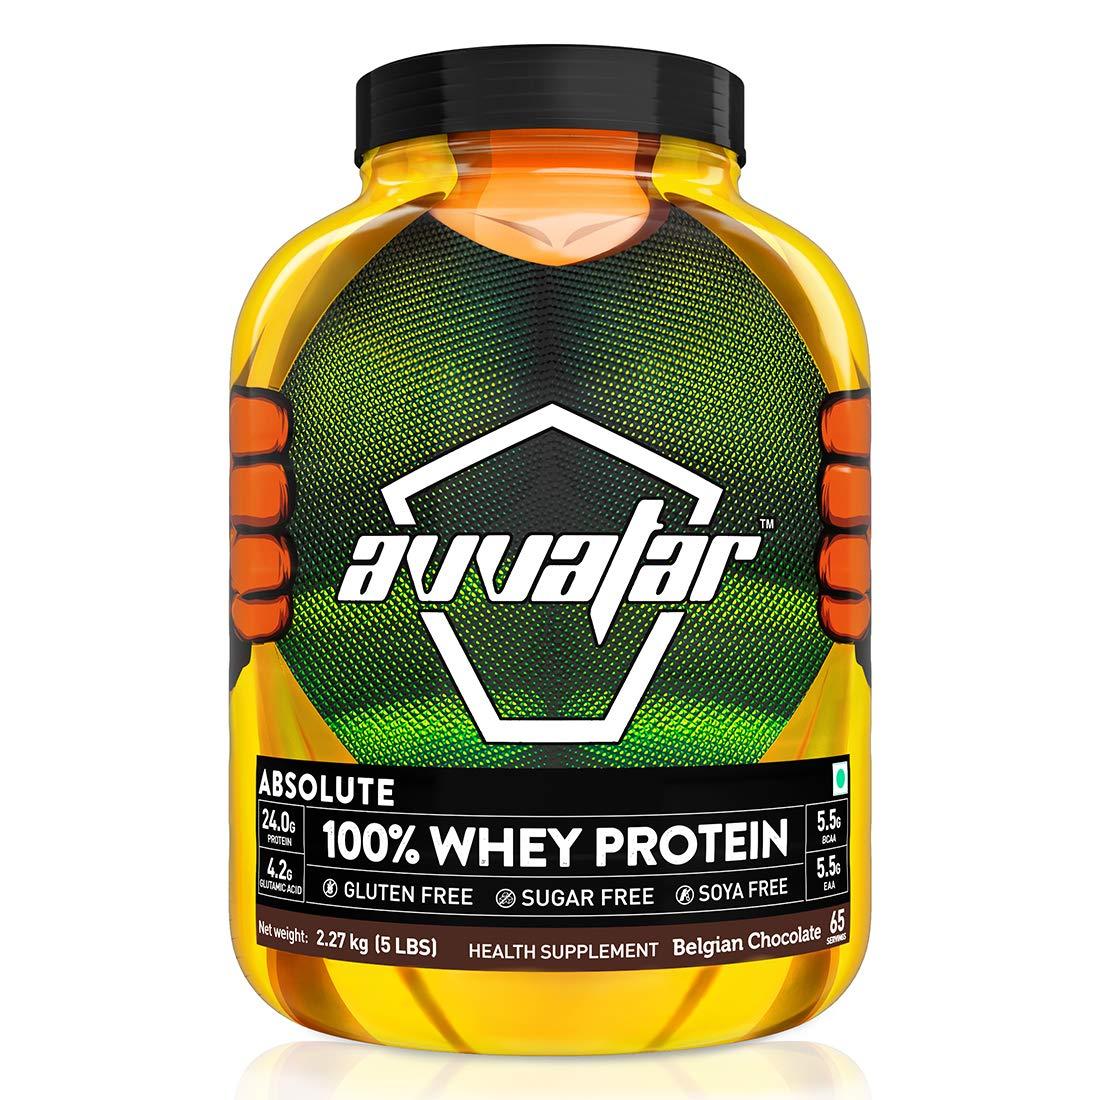 Avvatar 100% Whey Protein 5 lbs